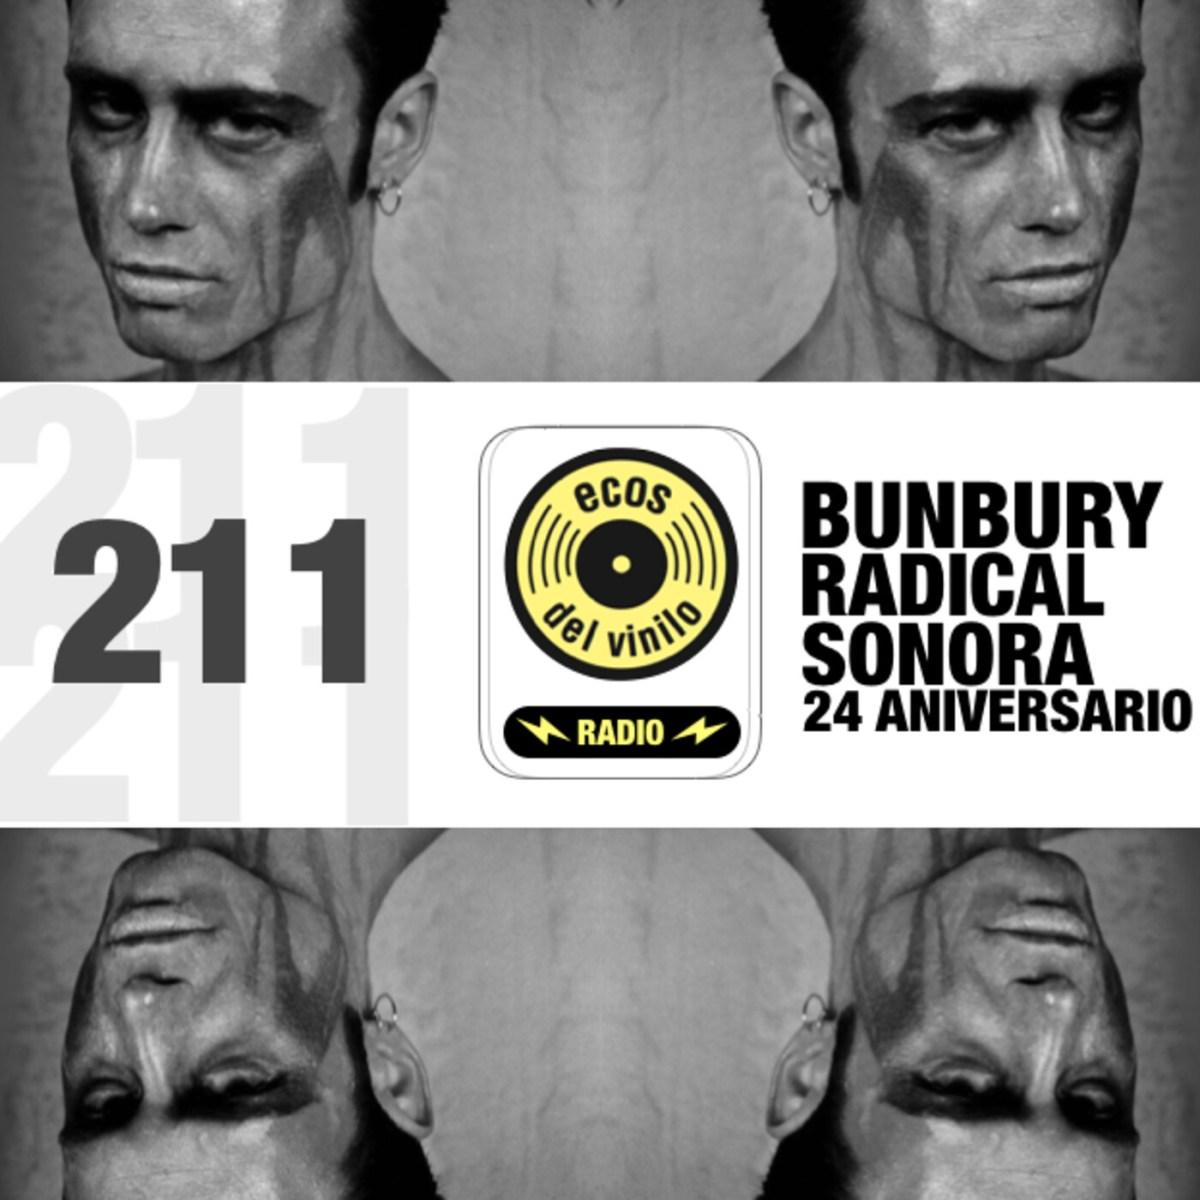 Bunbury / Radical Sonora 24 Aniversario | Programa 211 – Ecos del Vinilo Radio